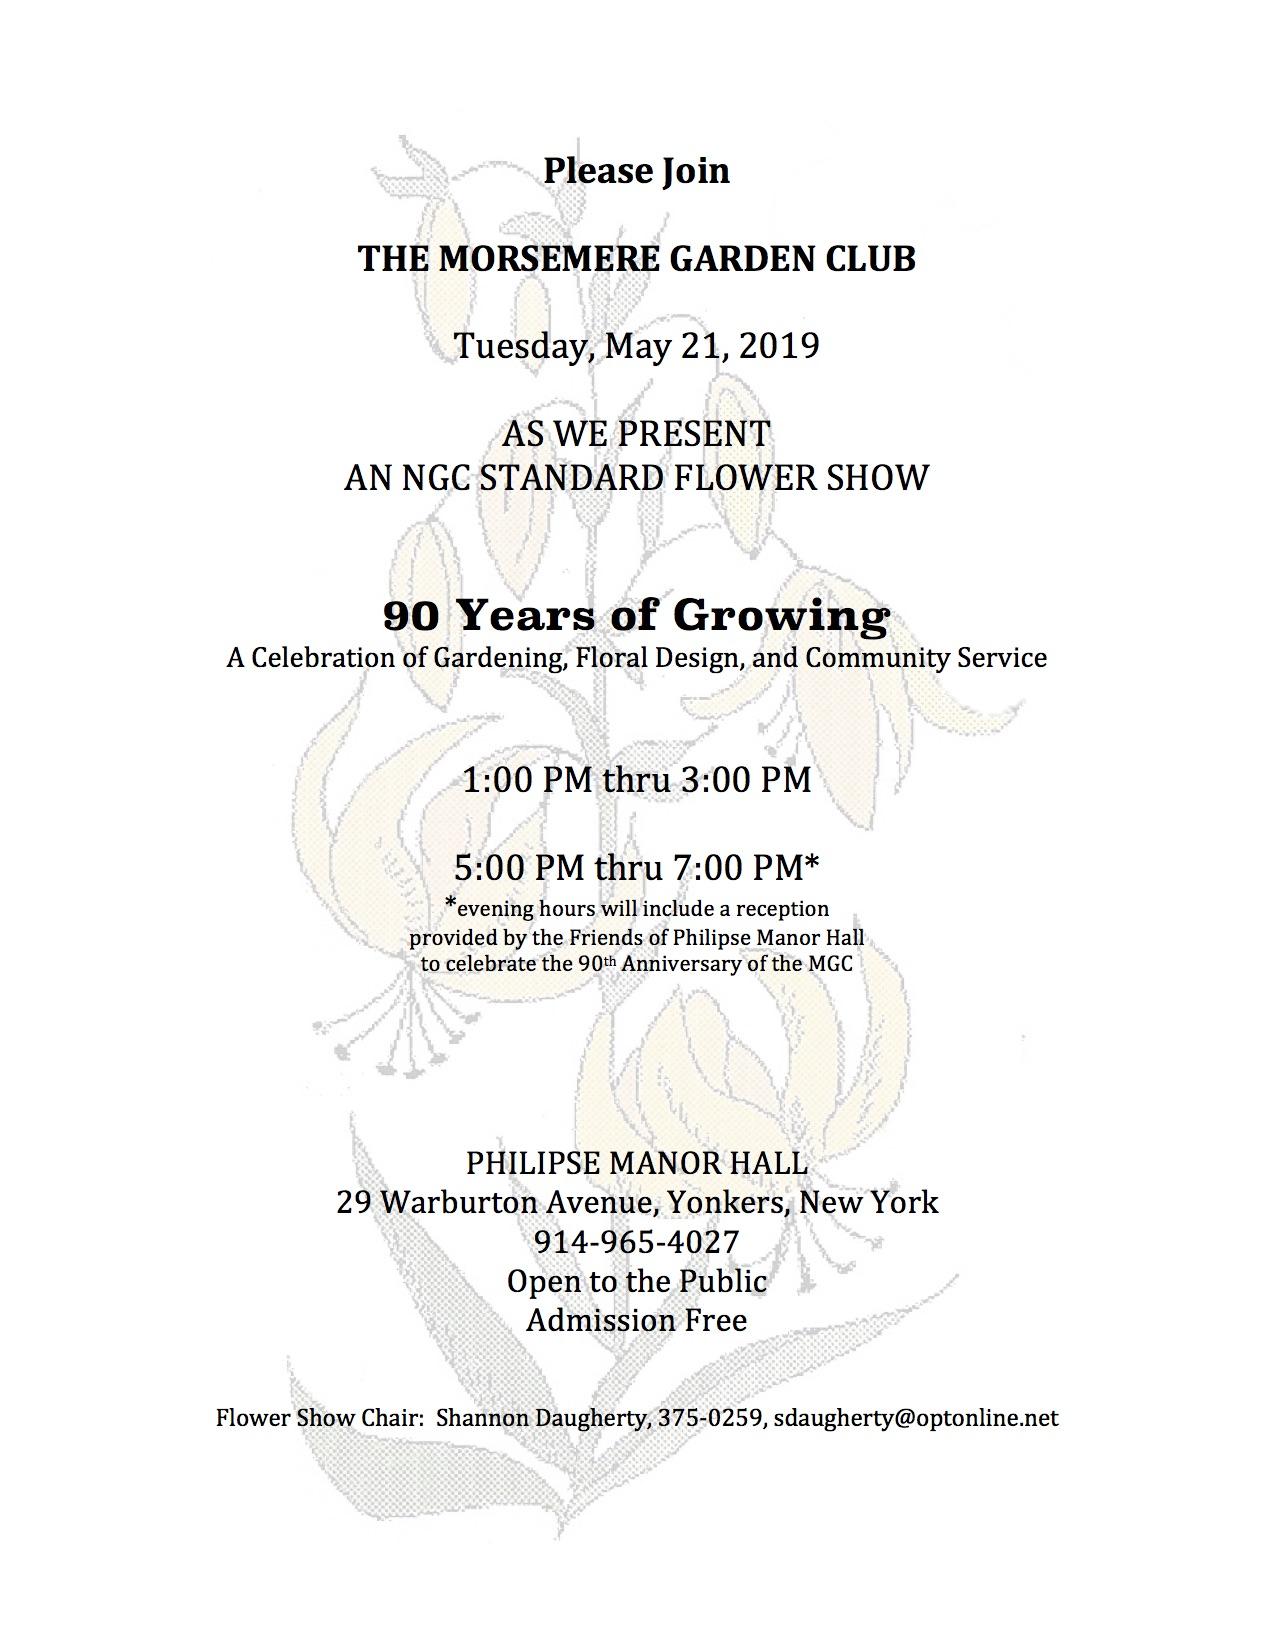 Morsemere Garden Club Flower Show